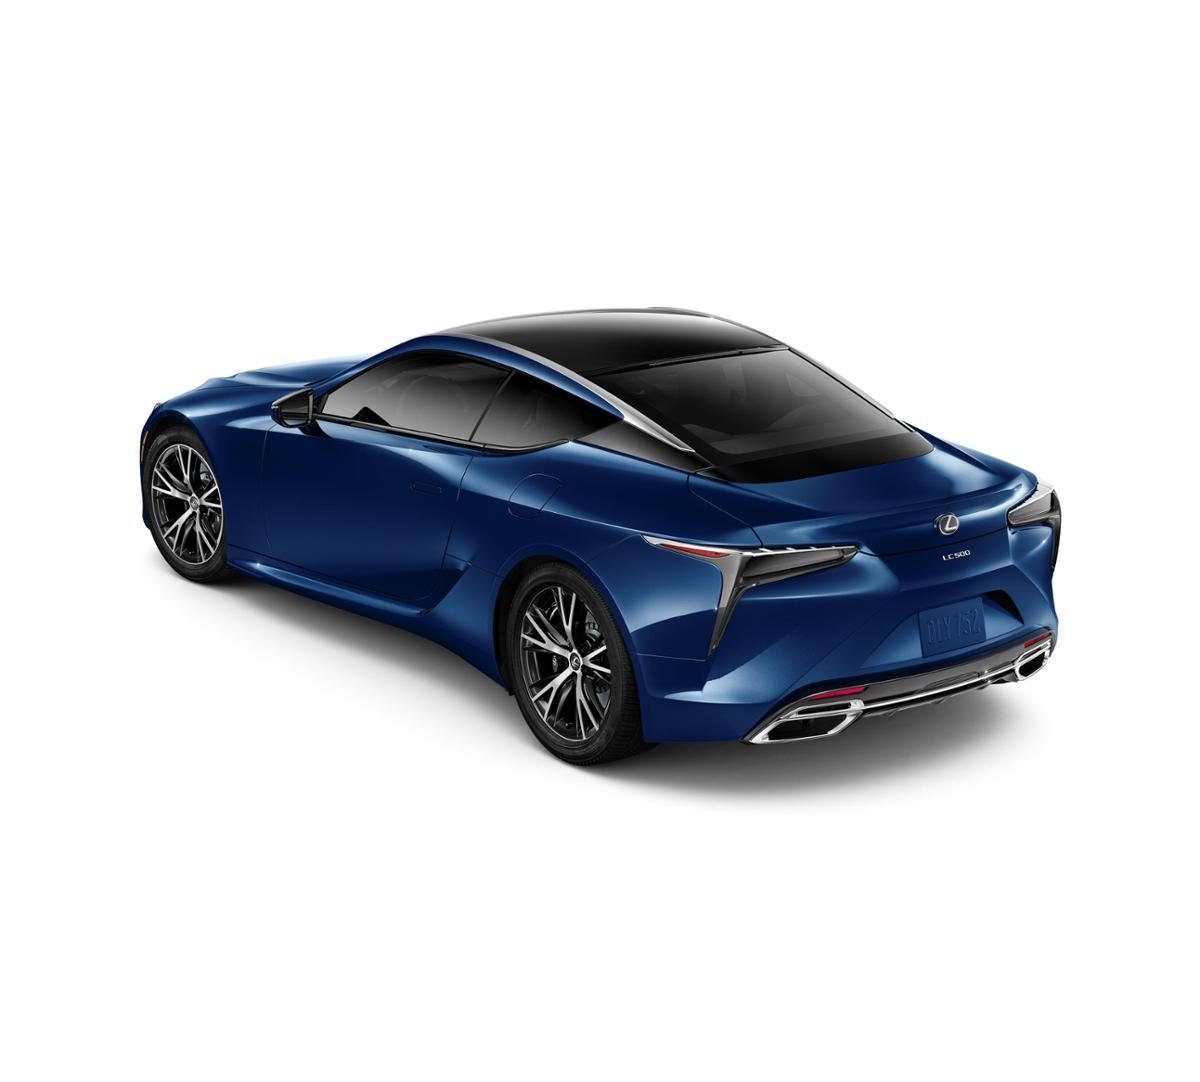 New Nightfall Mica 2019 Lexus LC 500 For Sale Fremont, CA